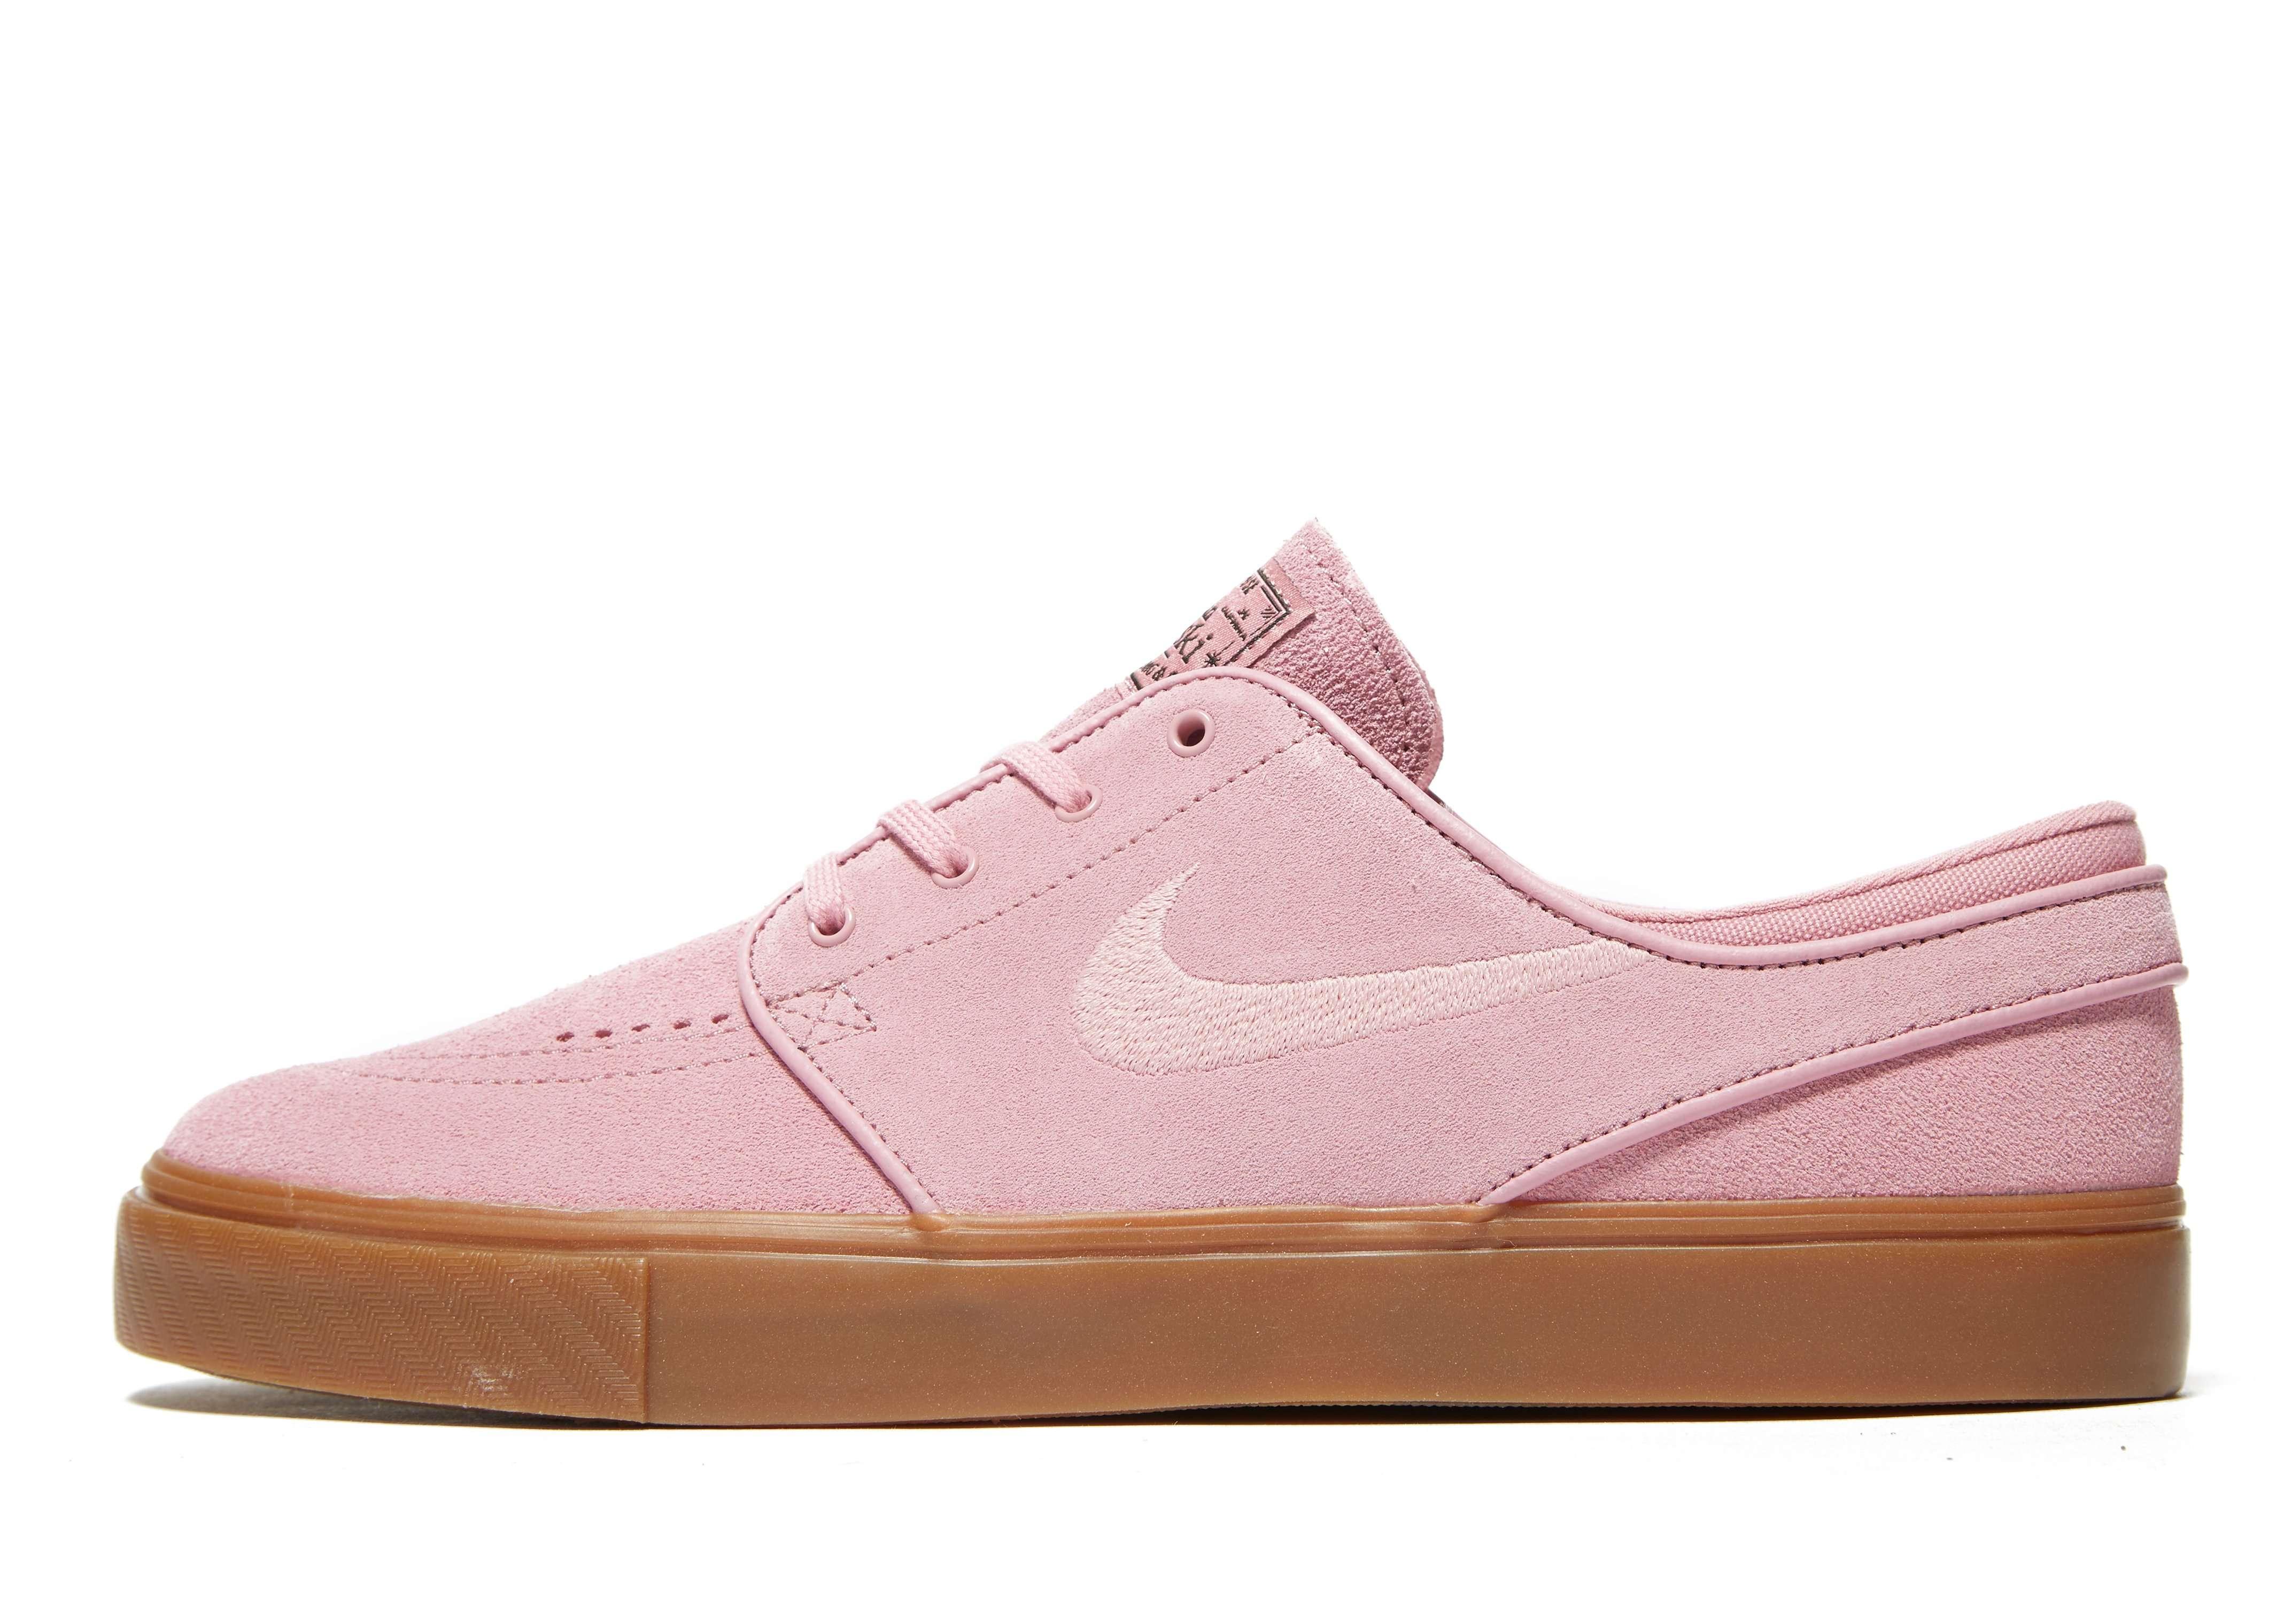 Nike SB Zoom Stefan Janoski - Men's Skate Shoes - Pink 009535